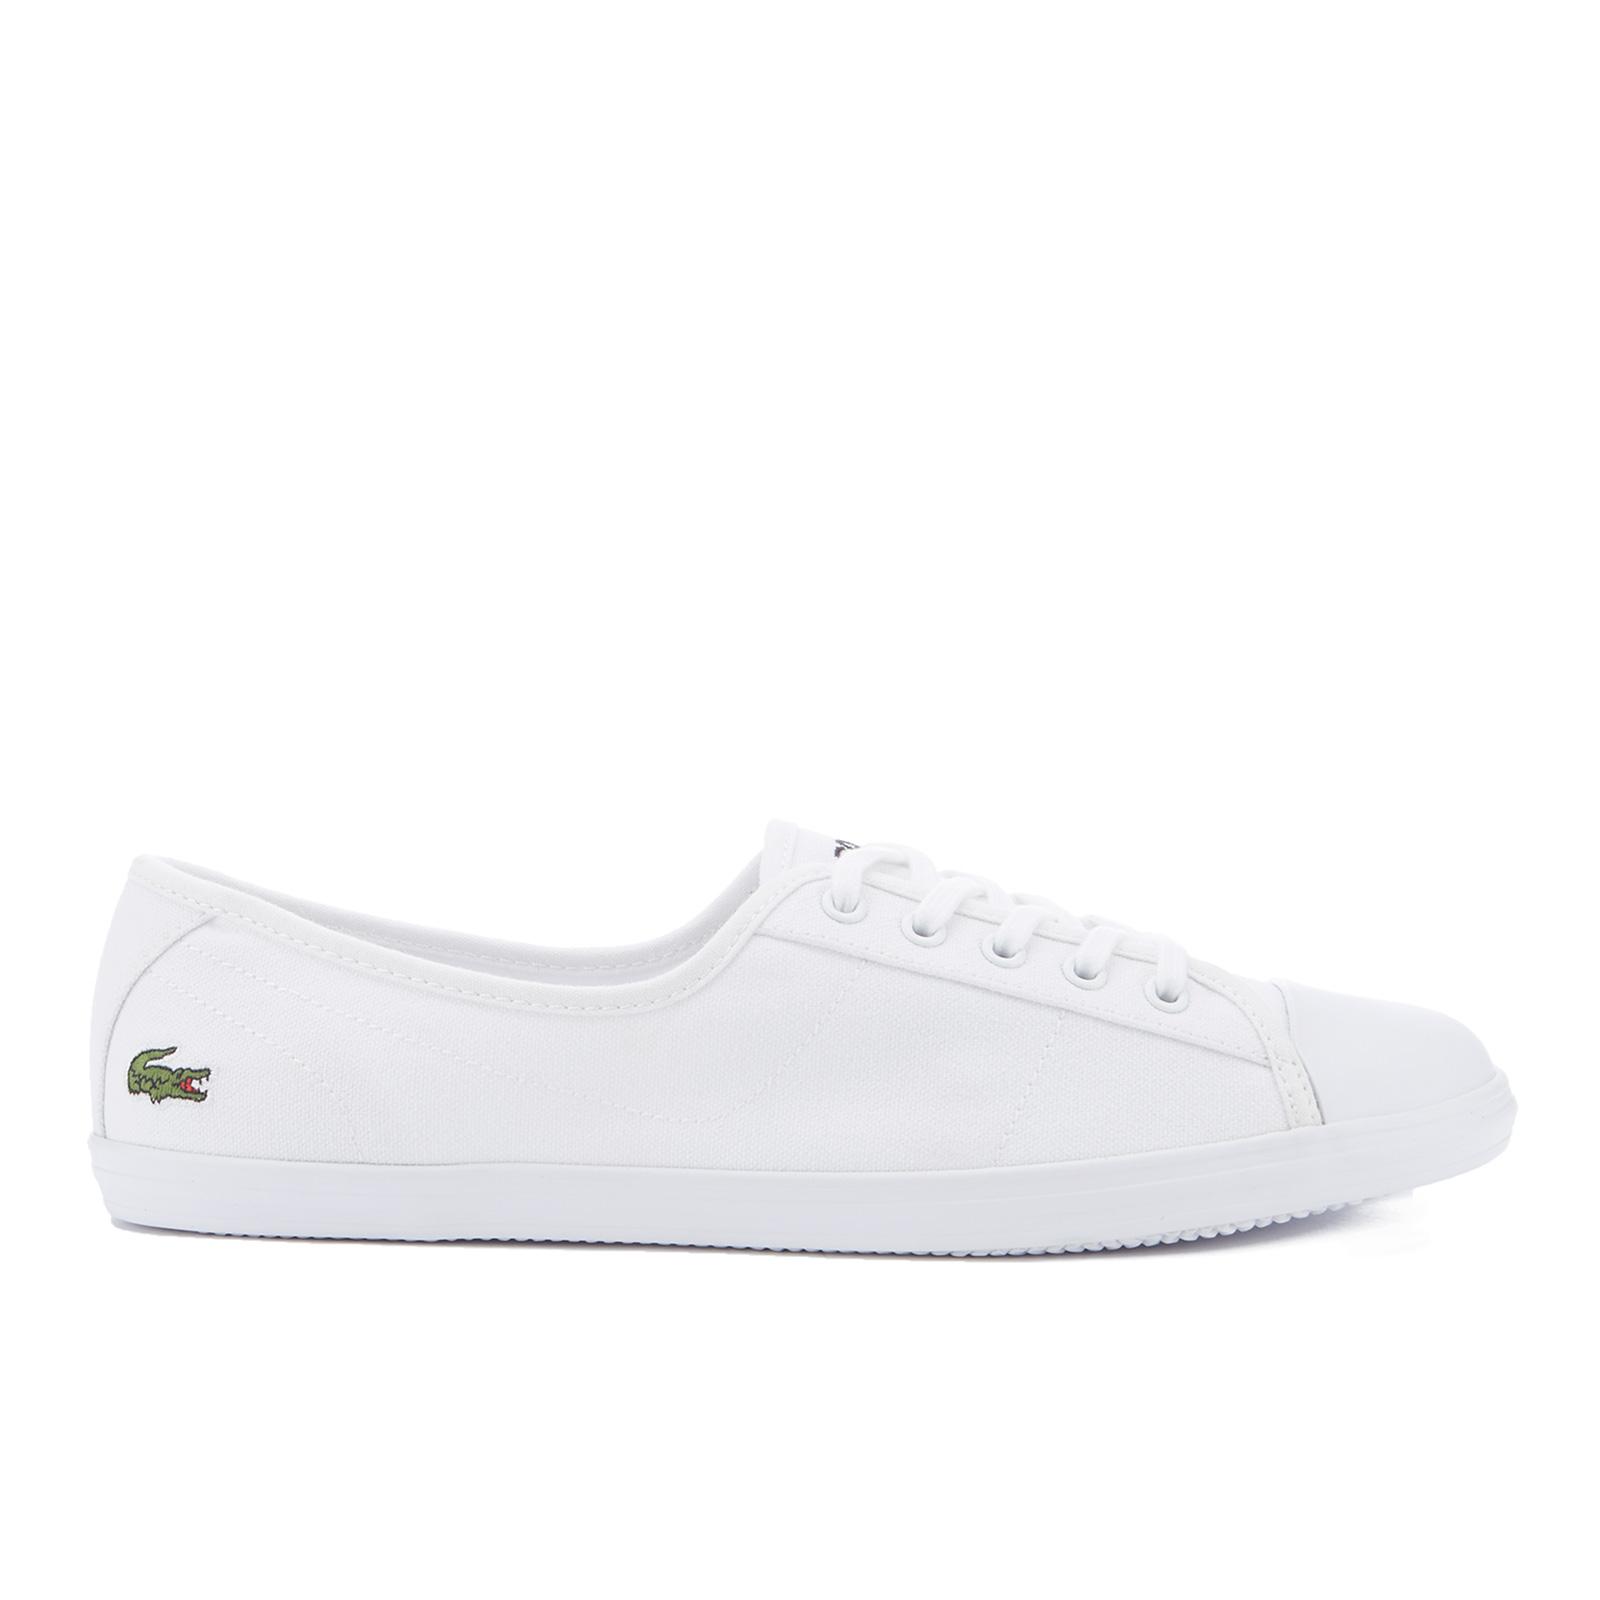 26368555f6e12b Lacoste Women s Ziane Bl 2 Canvas Plimsols - White - Free UK Delivery over  £50